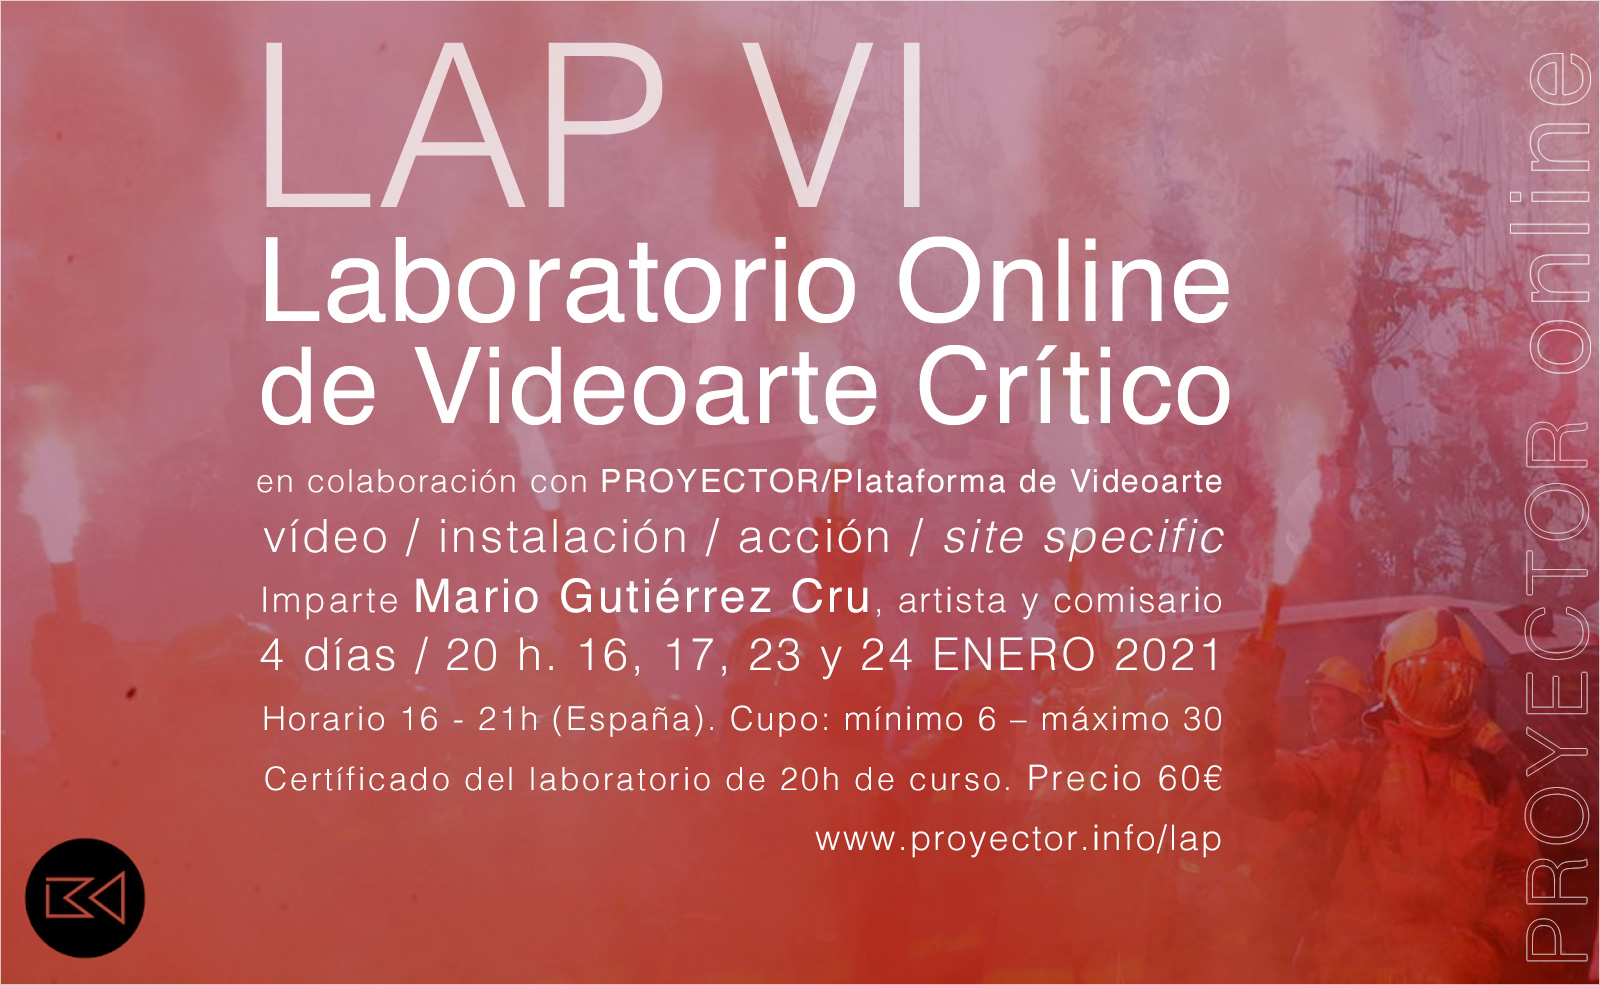 16-24.01.2021. LAP VI – Laboratorio Online de Videoarte Crítico